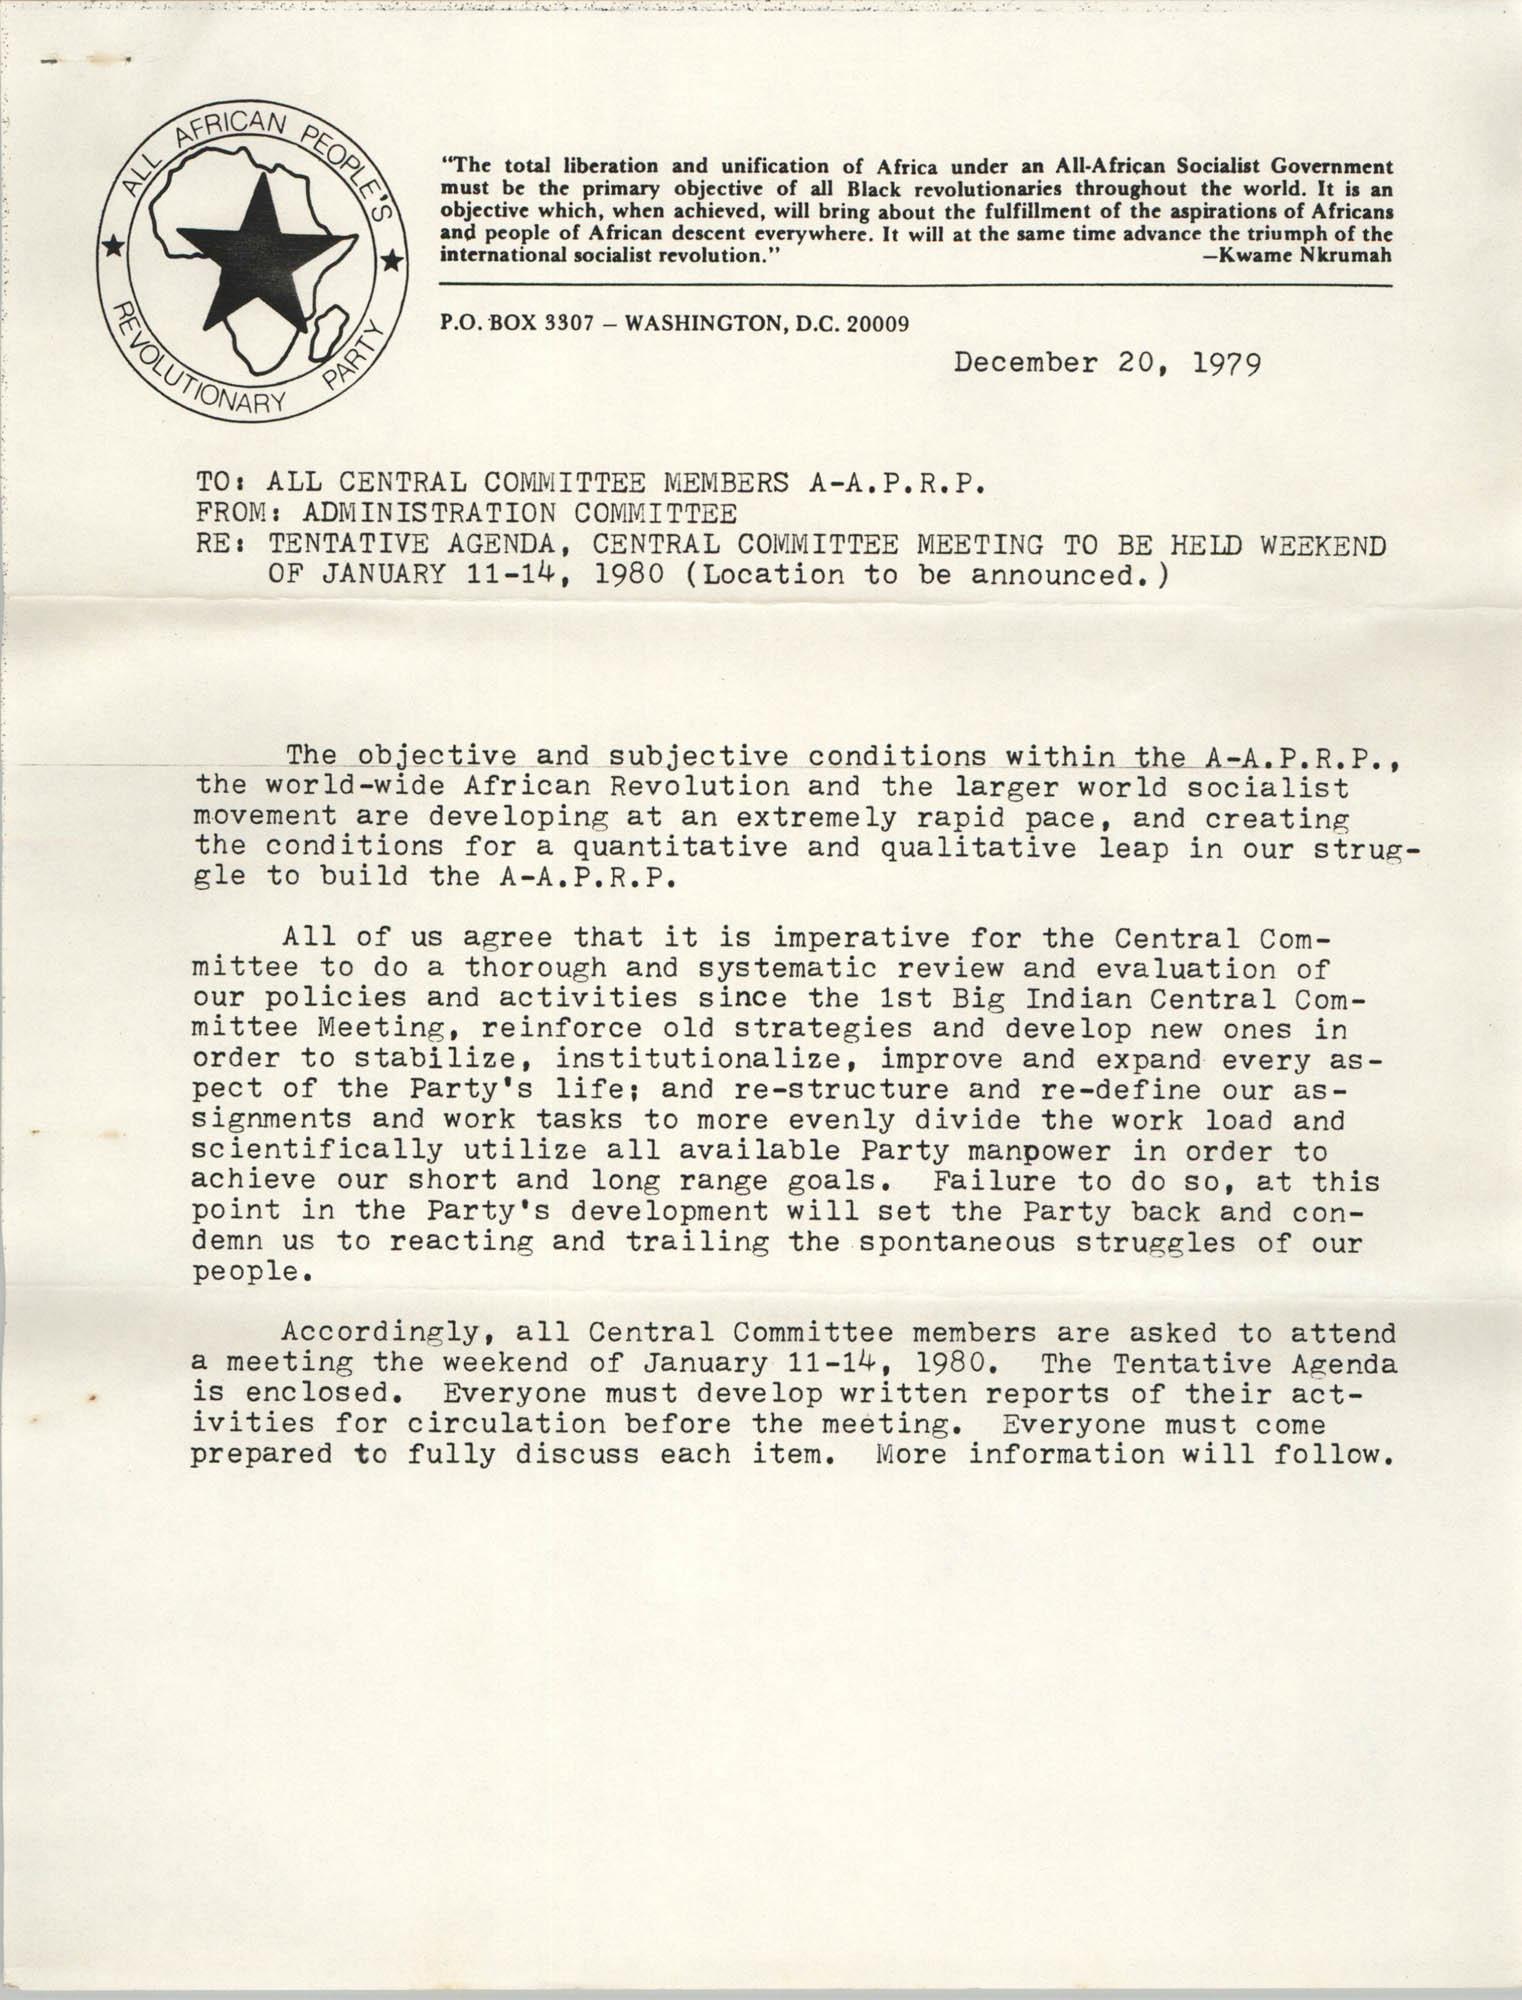 All African People's Revolutionary Party Memorandum, December 20, 1979